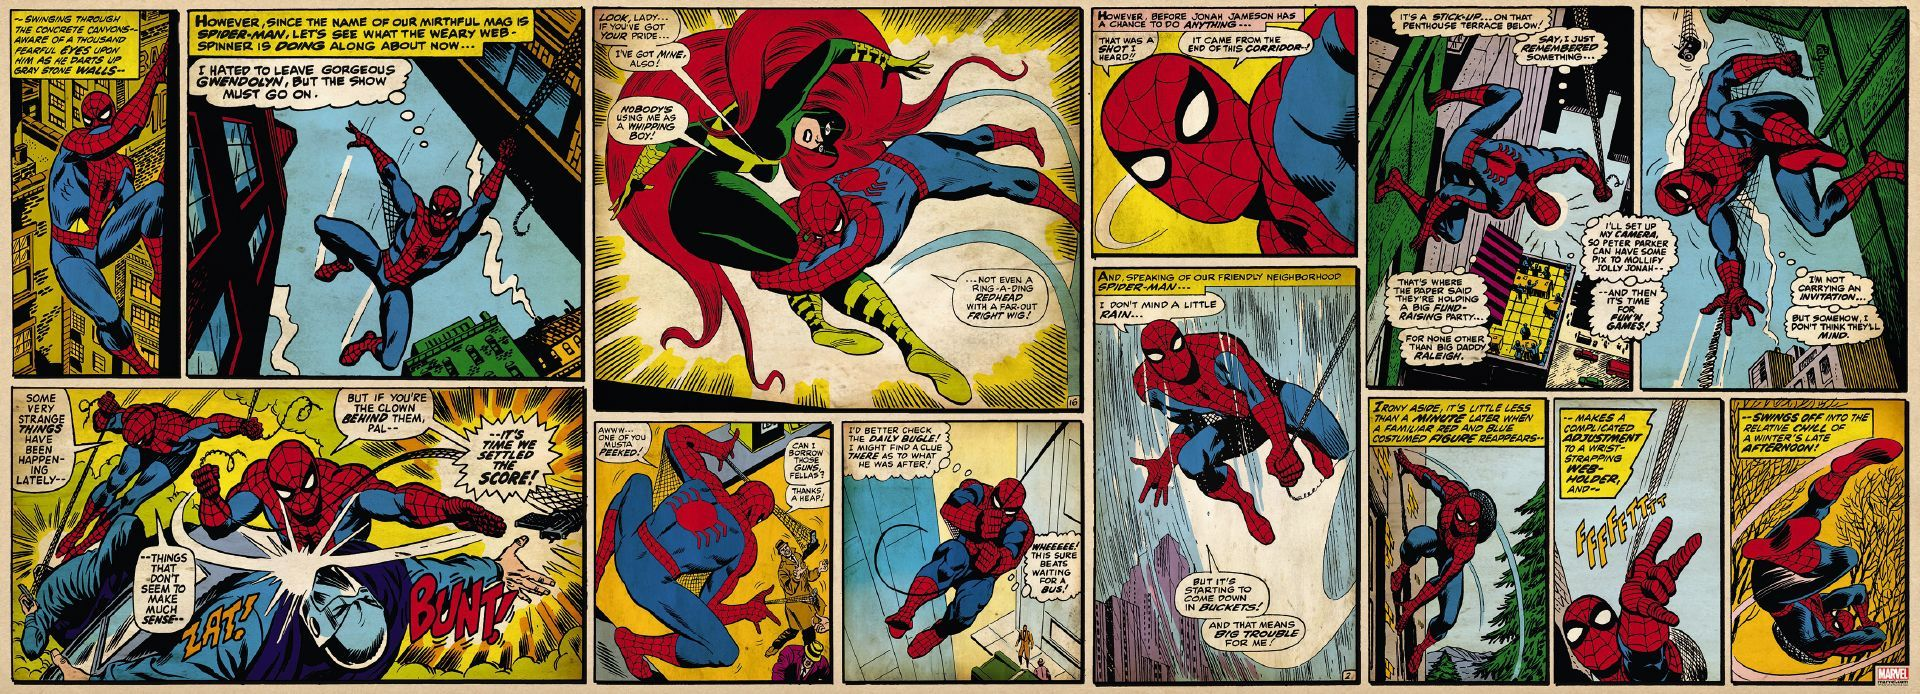 comics marvel spiderman hd - Buscar con Google | party MARBEL ...